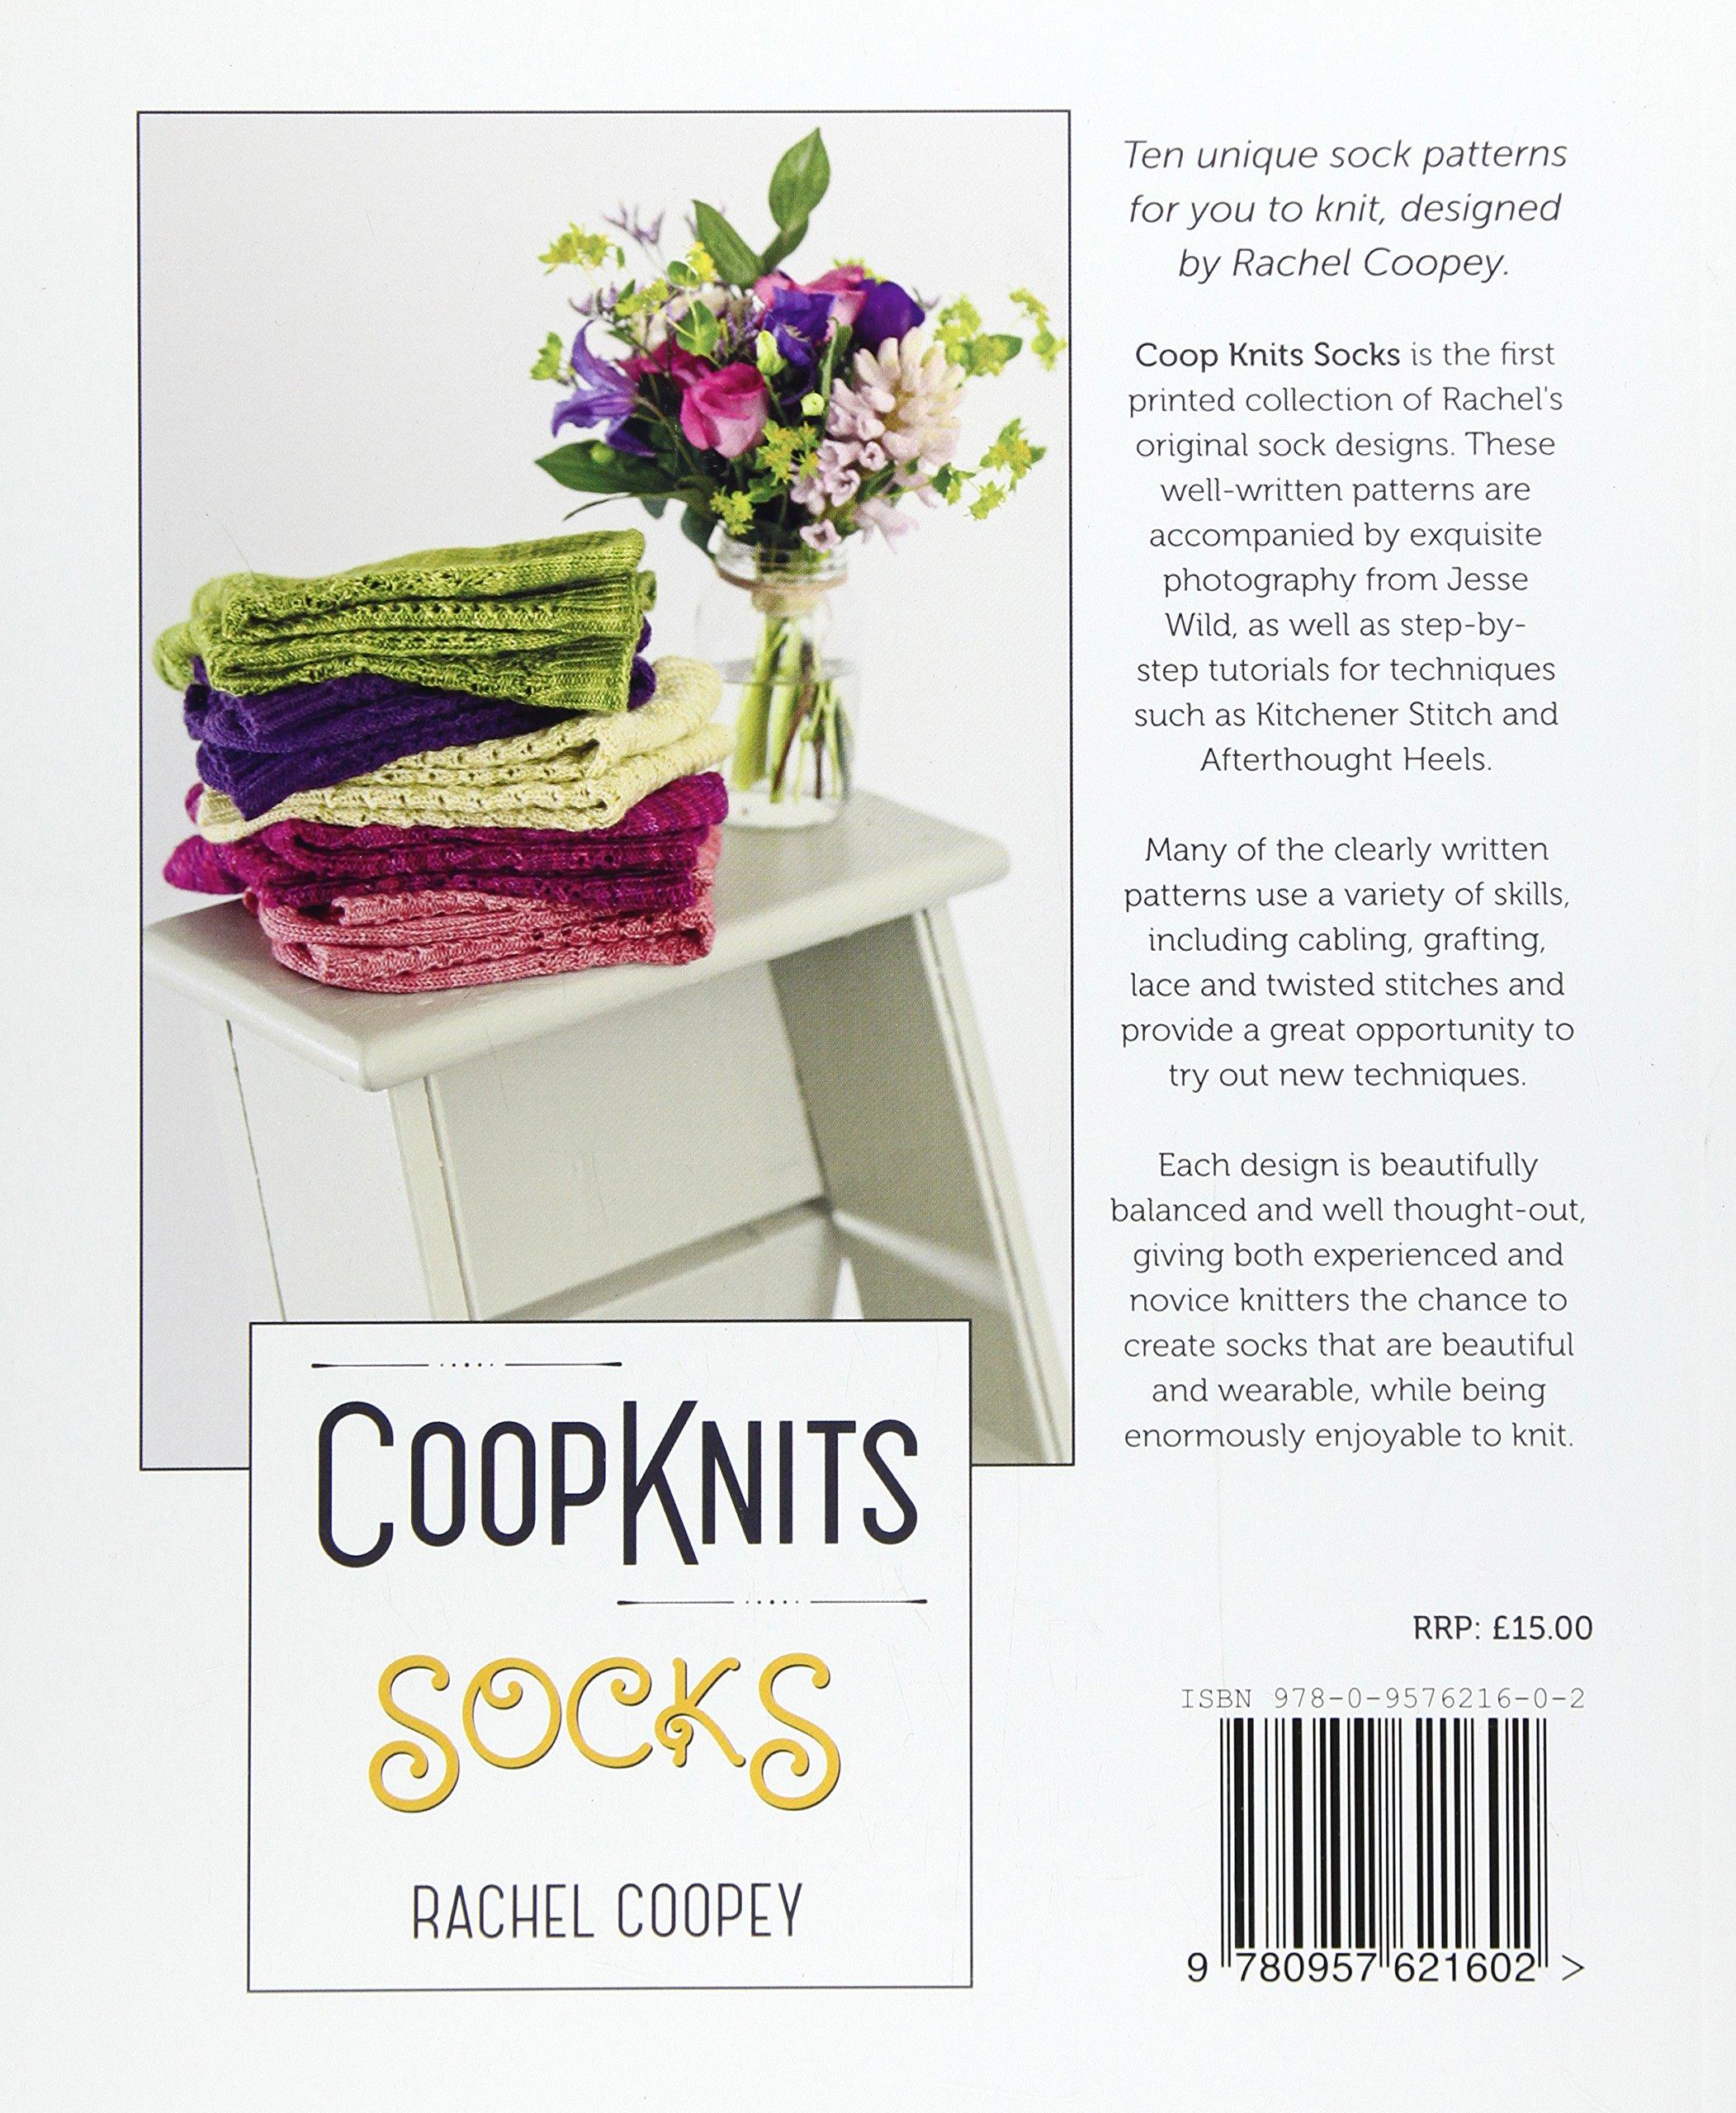 Coop Knits Socks: Rachel Coopey: 9780957621602: Amazon.com: Books